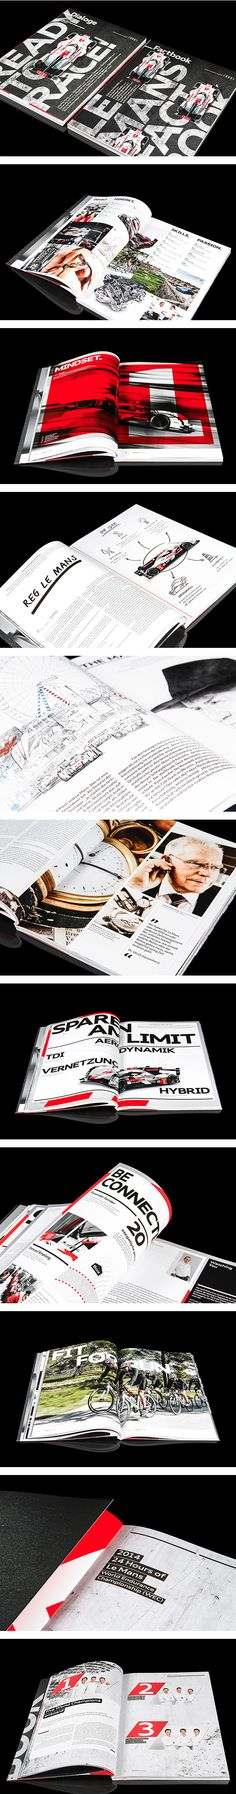 Dialoge – Das Audi-Technologiemagazin 2014/2 by stapelberg & fritz